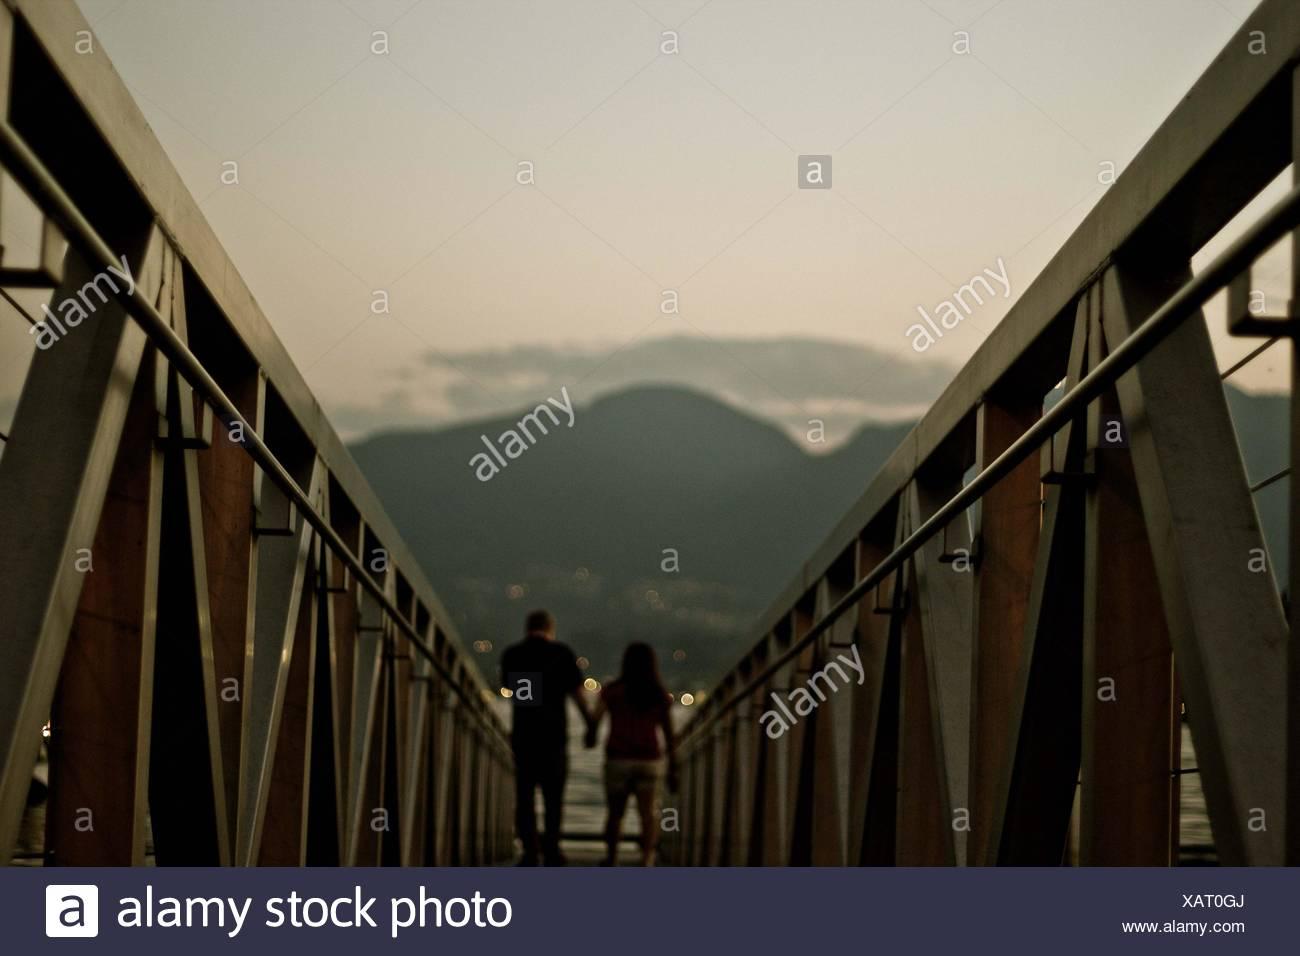 Rear View Of Couple Walking Along Railings - Stock Image